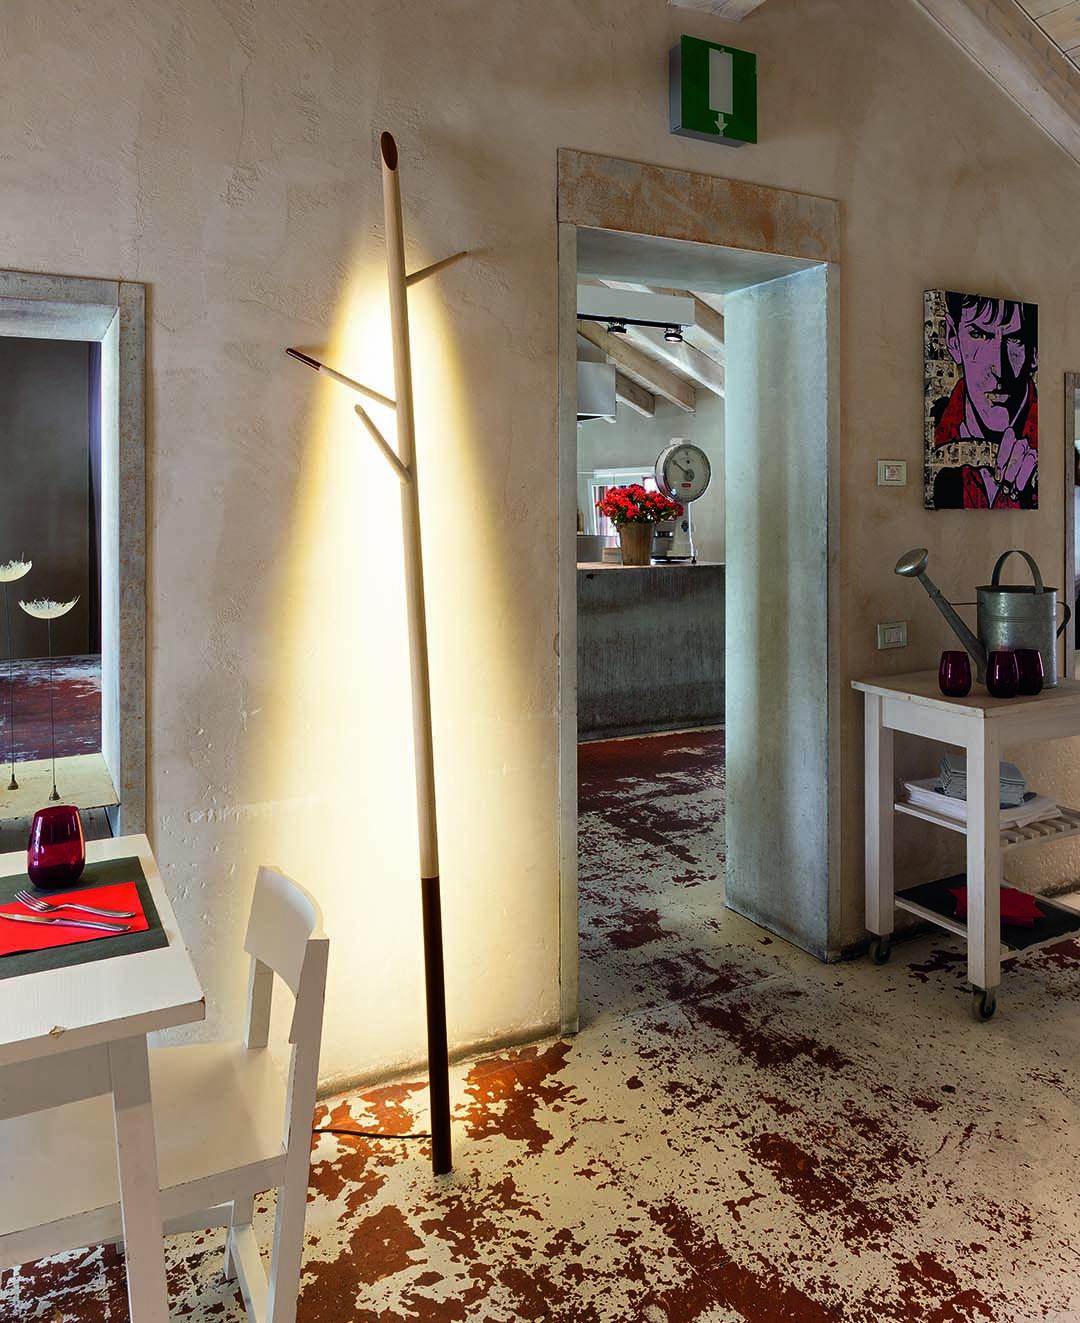 Wildlight design by Oriano Favaretto | Floor lamp in oak with cable in fabric | #light4 #design #lamp